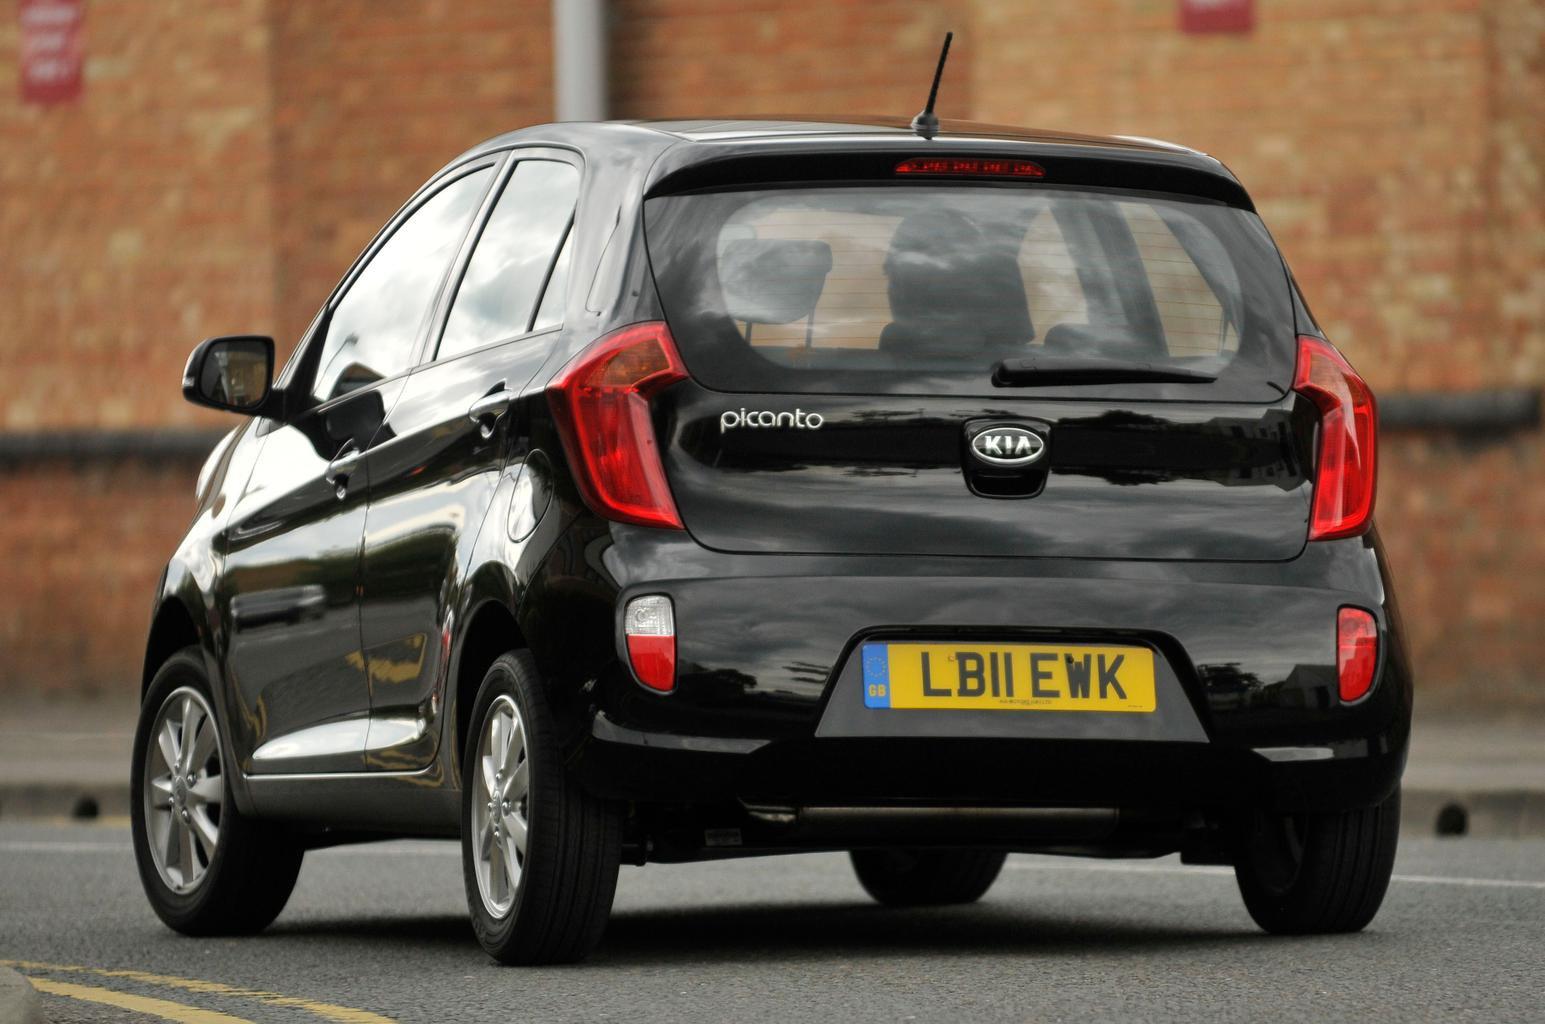 Used Fiat 500 vs Kia Picanto vs Hyundai i10